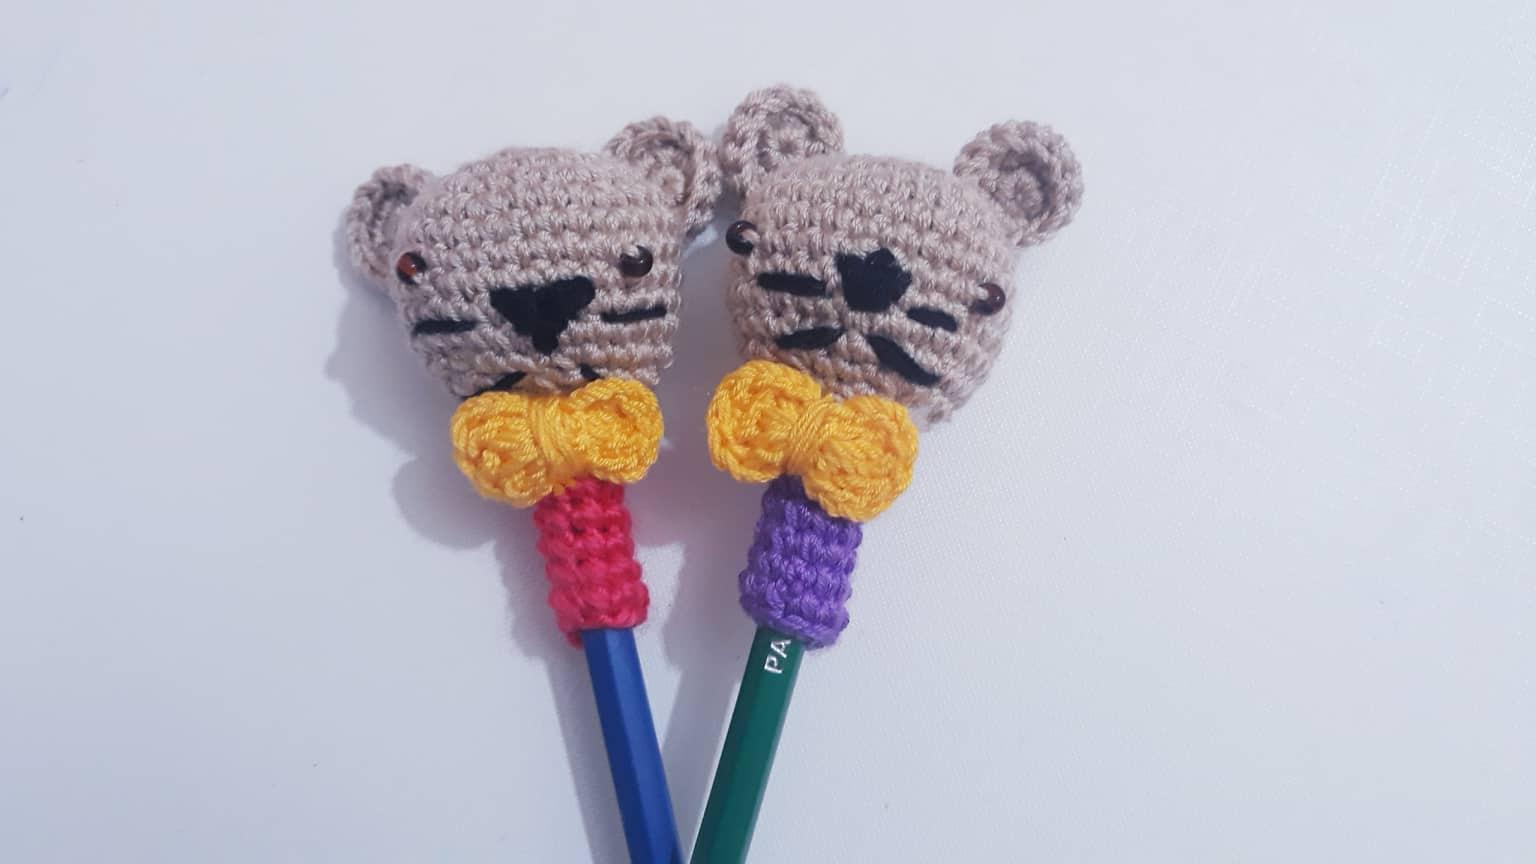 How To Crochet Amigurumi Donut - Crochet Tutorial | Croby Patterns ... | 864x1536